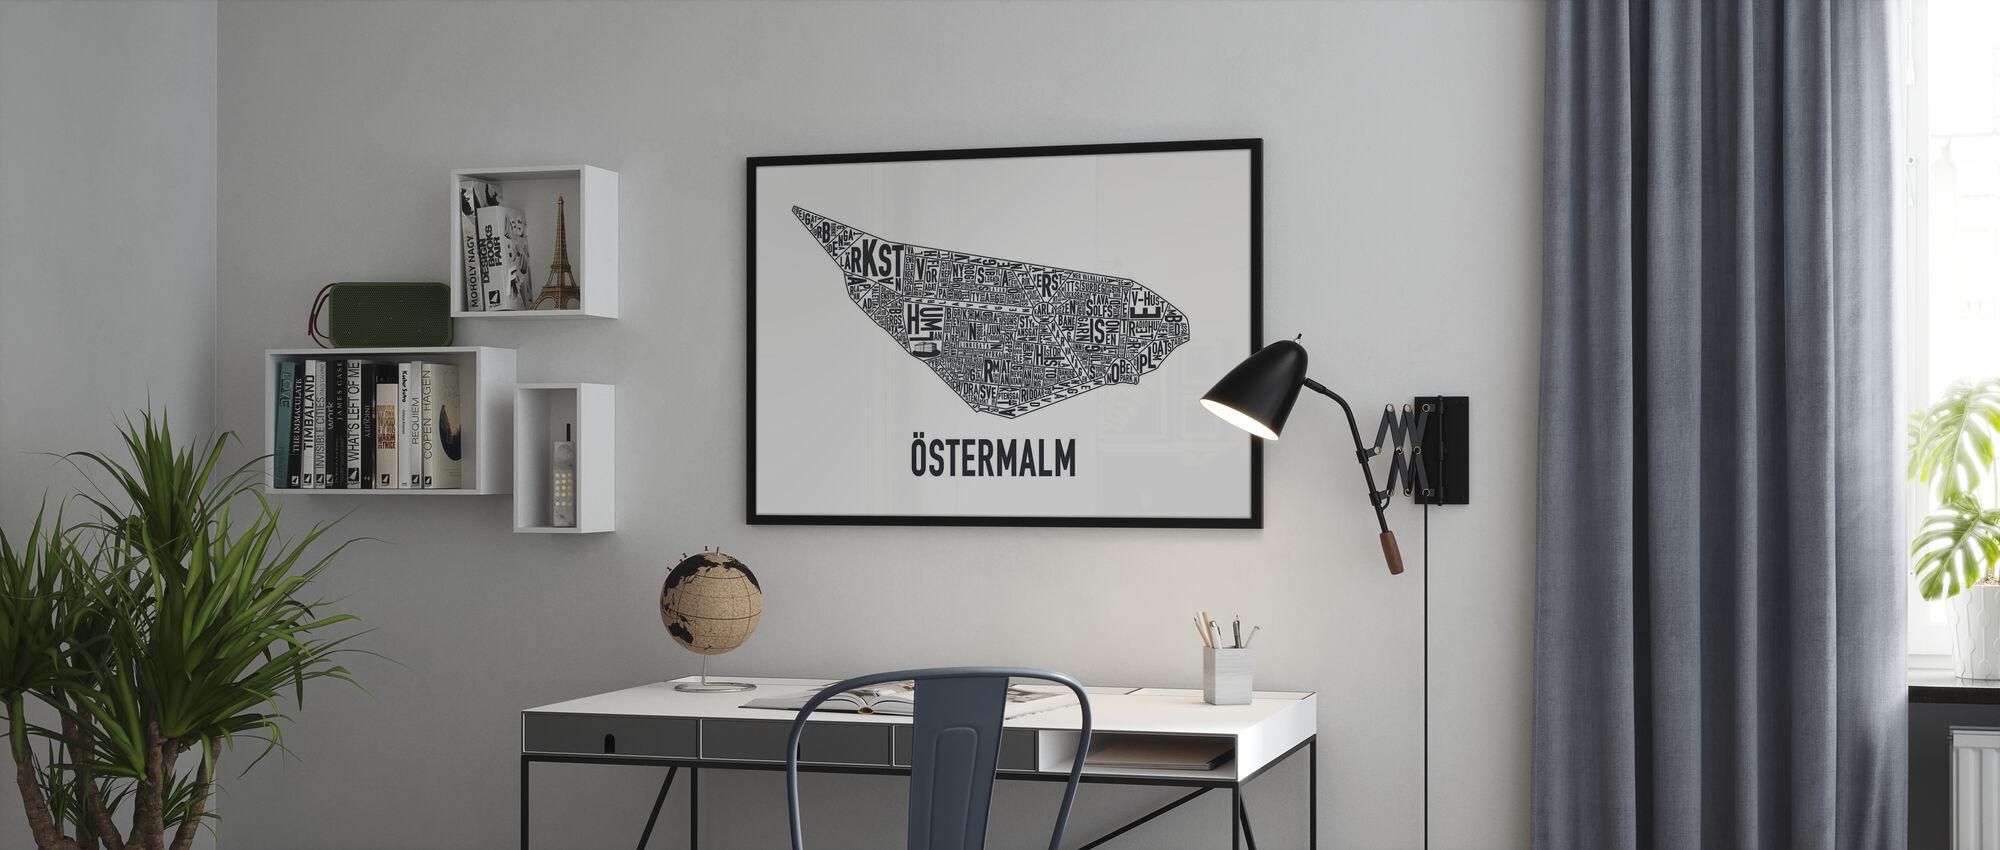 Ostermalm - Plakat - Kontor